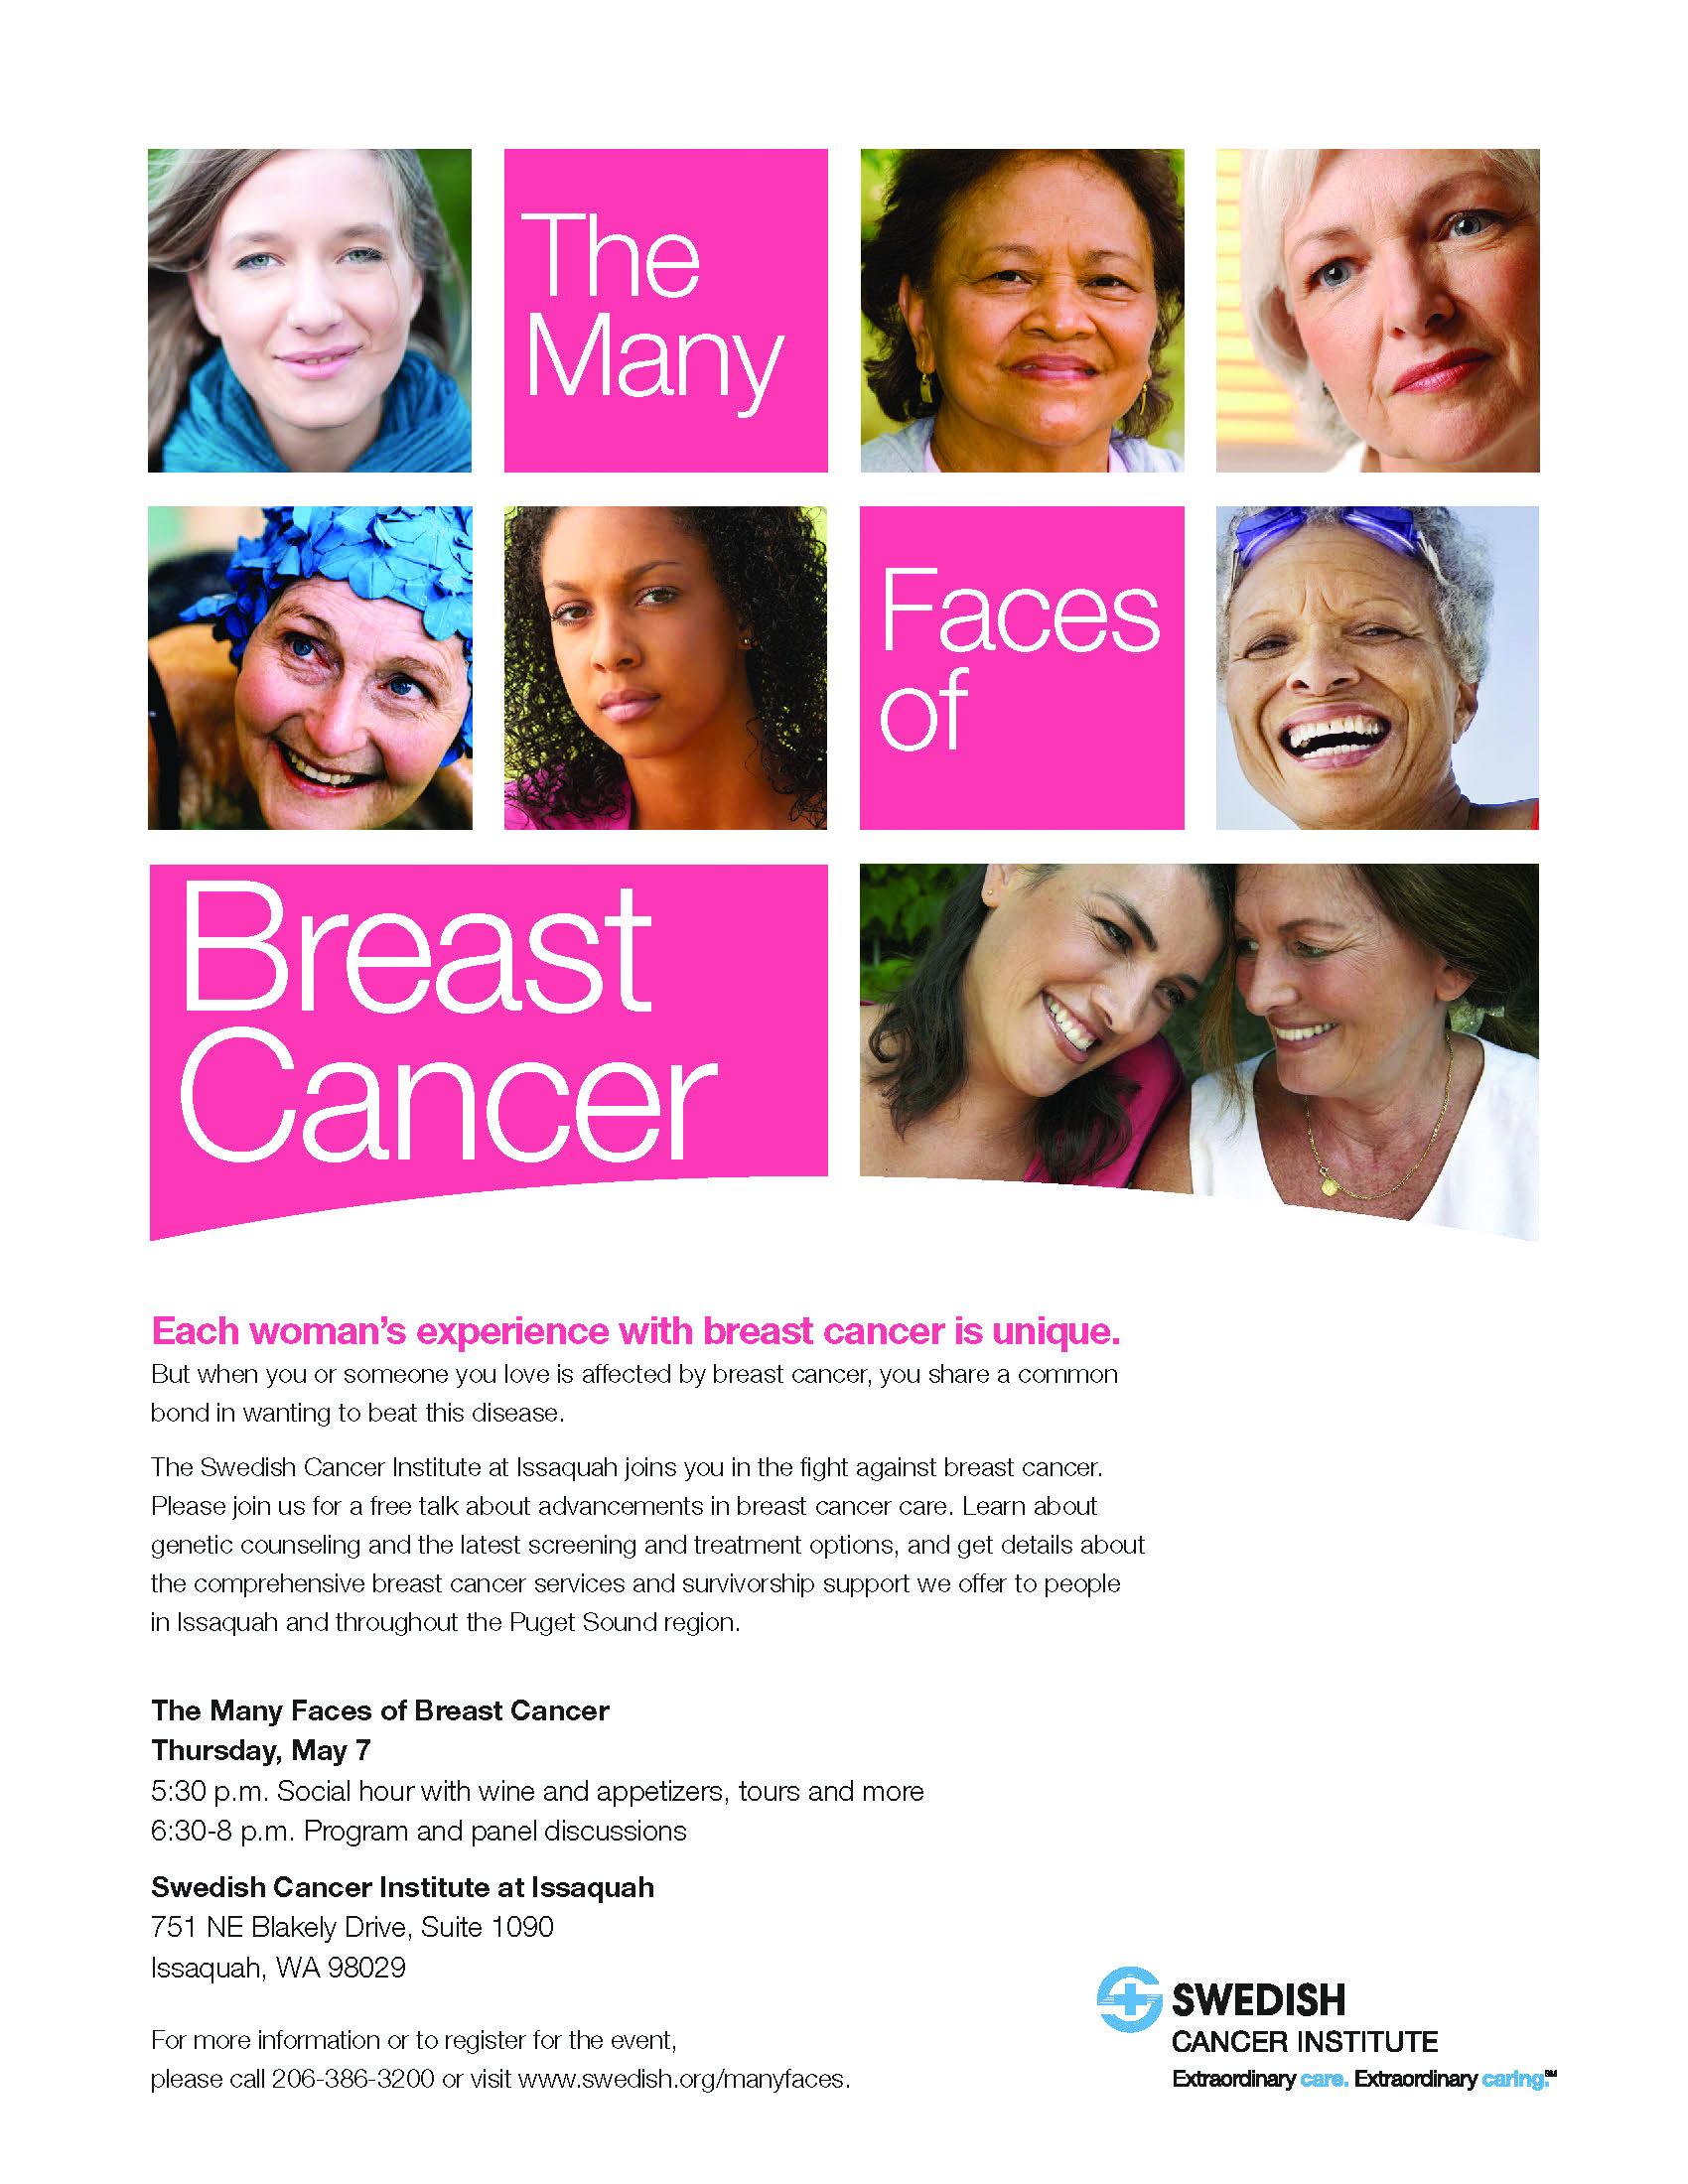 001 NEW FH Swedish Breast Cancer